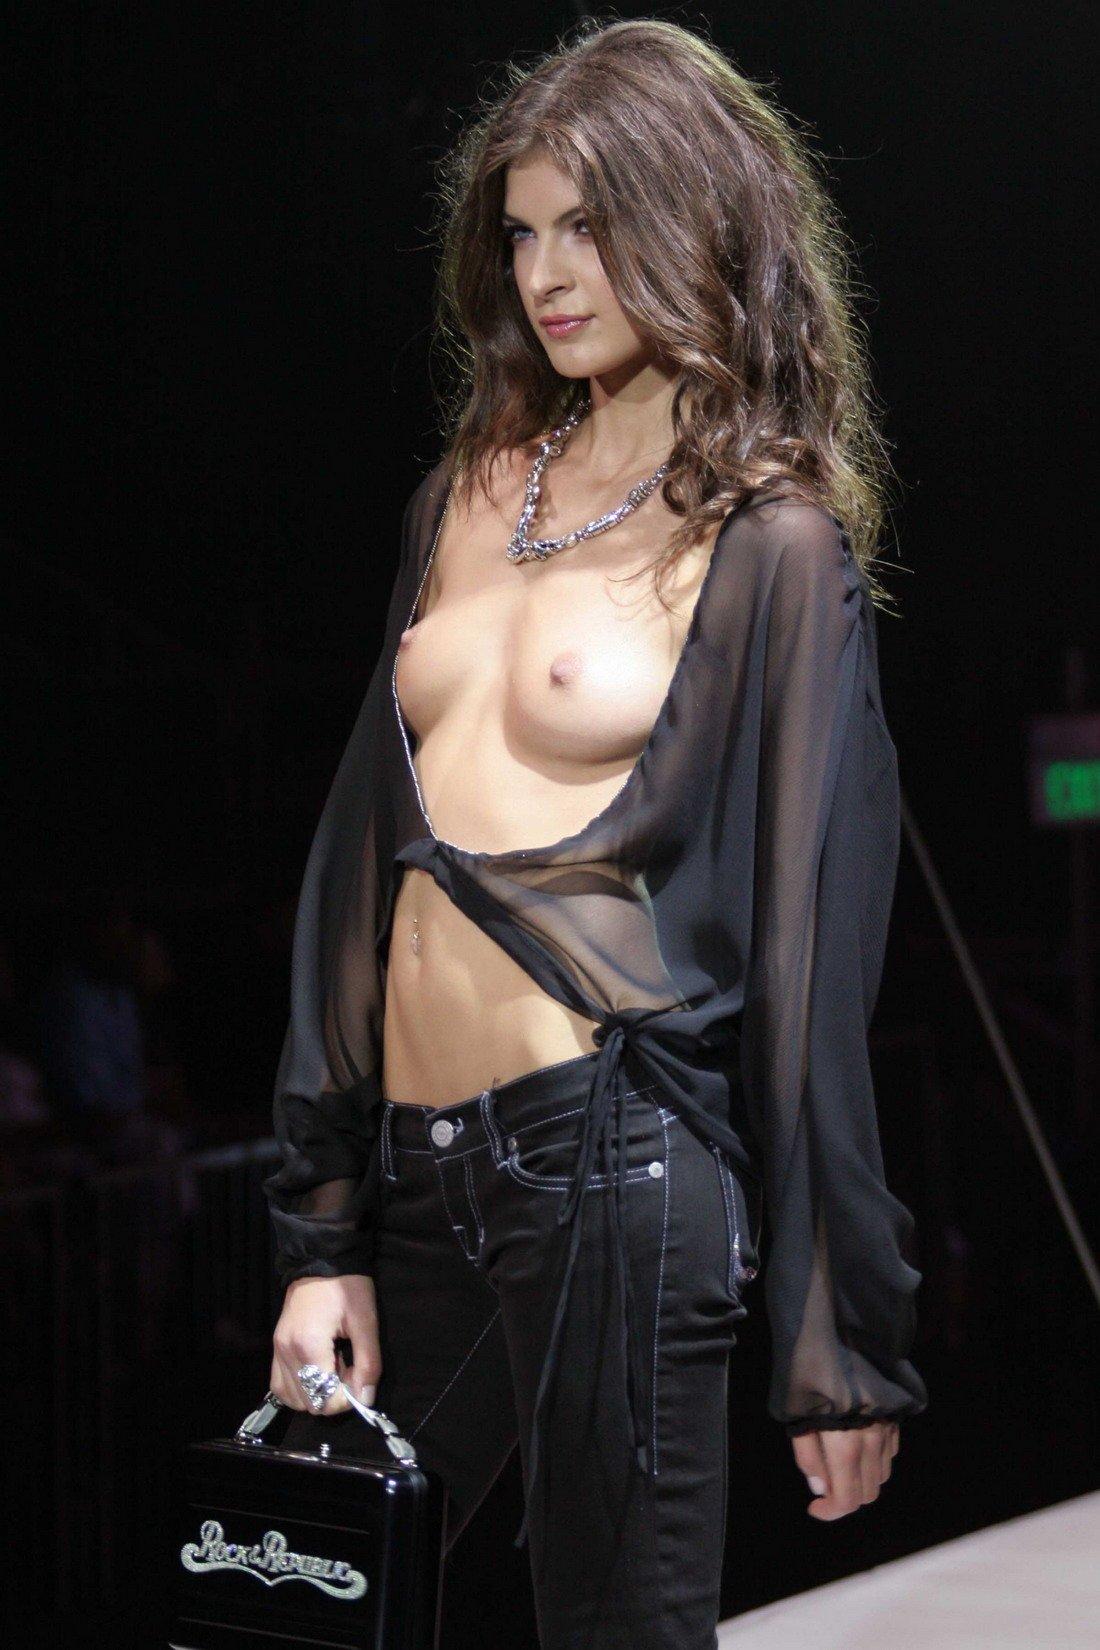 Eve Hewson: Hottest Photos On The Internet